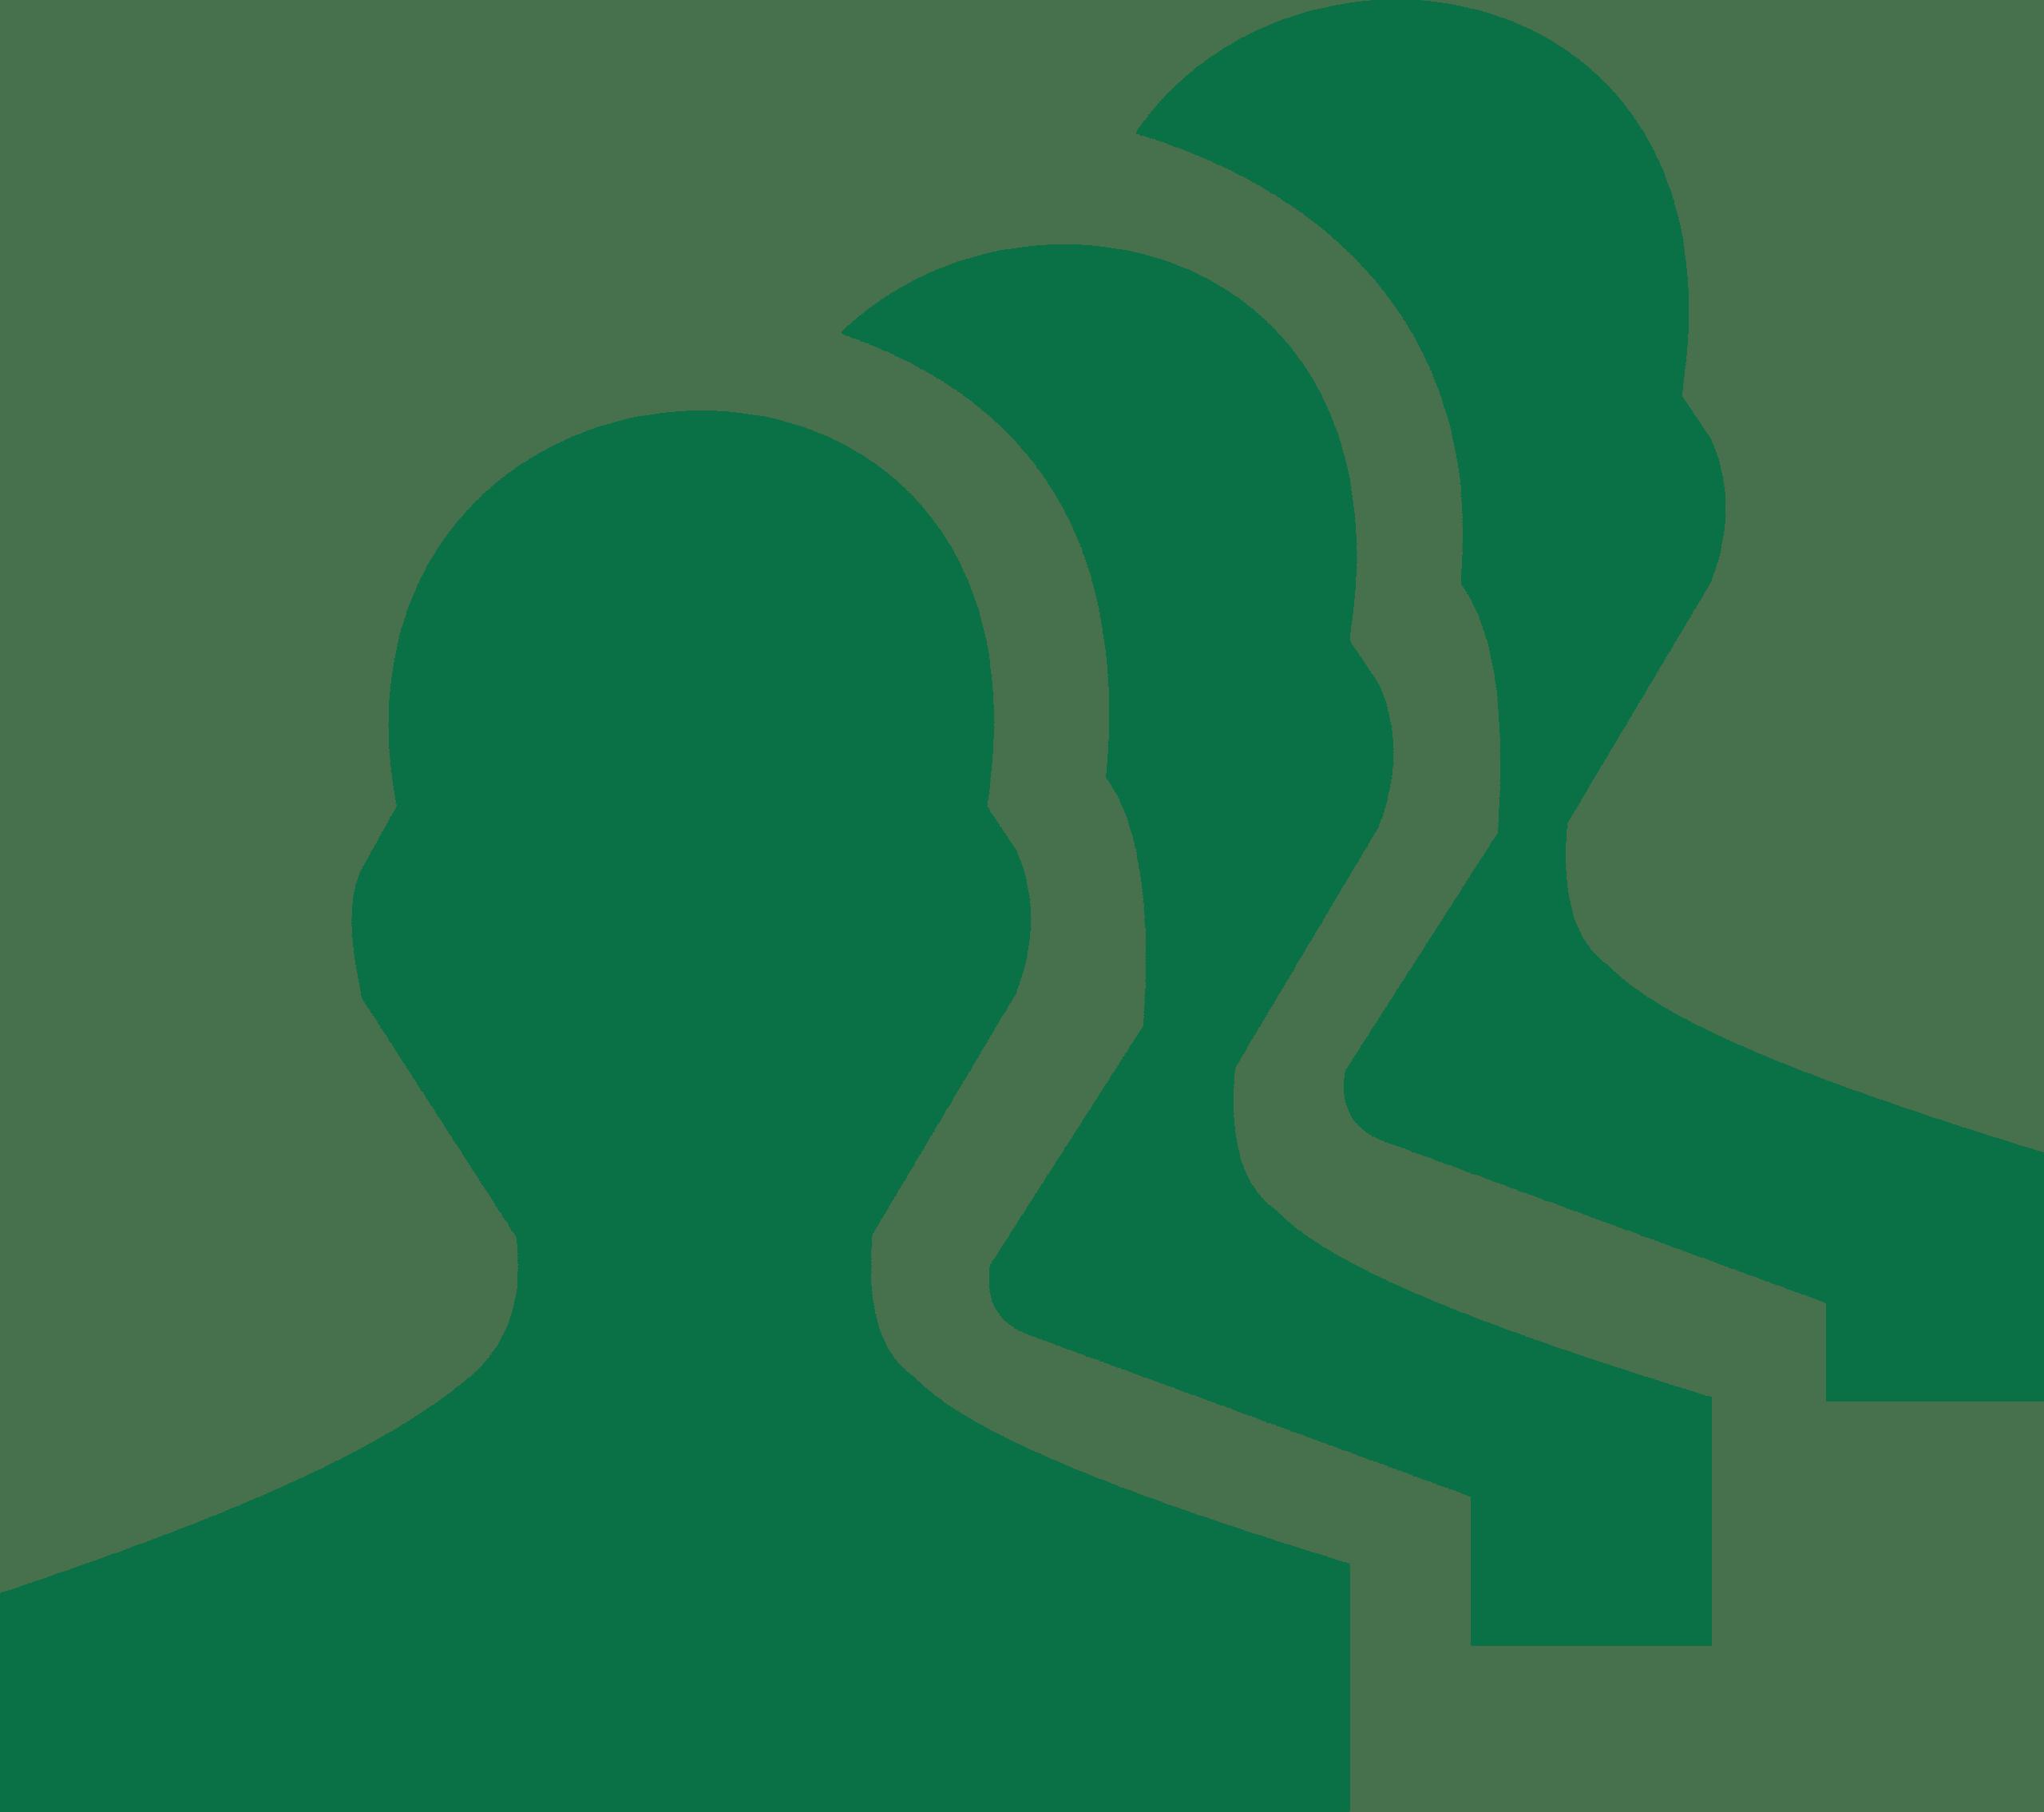 AccountStaff Staff & Senior accountants Graphic - graphic of three people